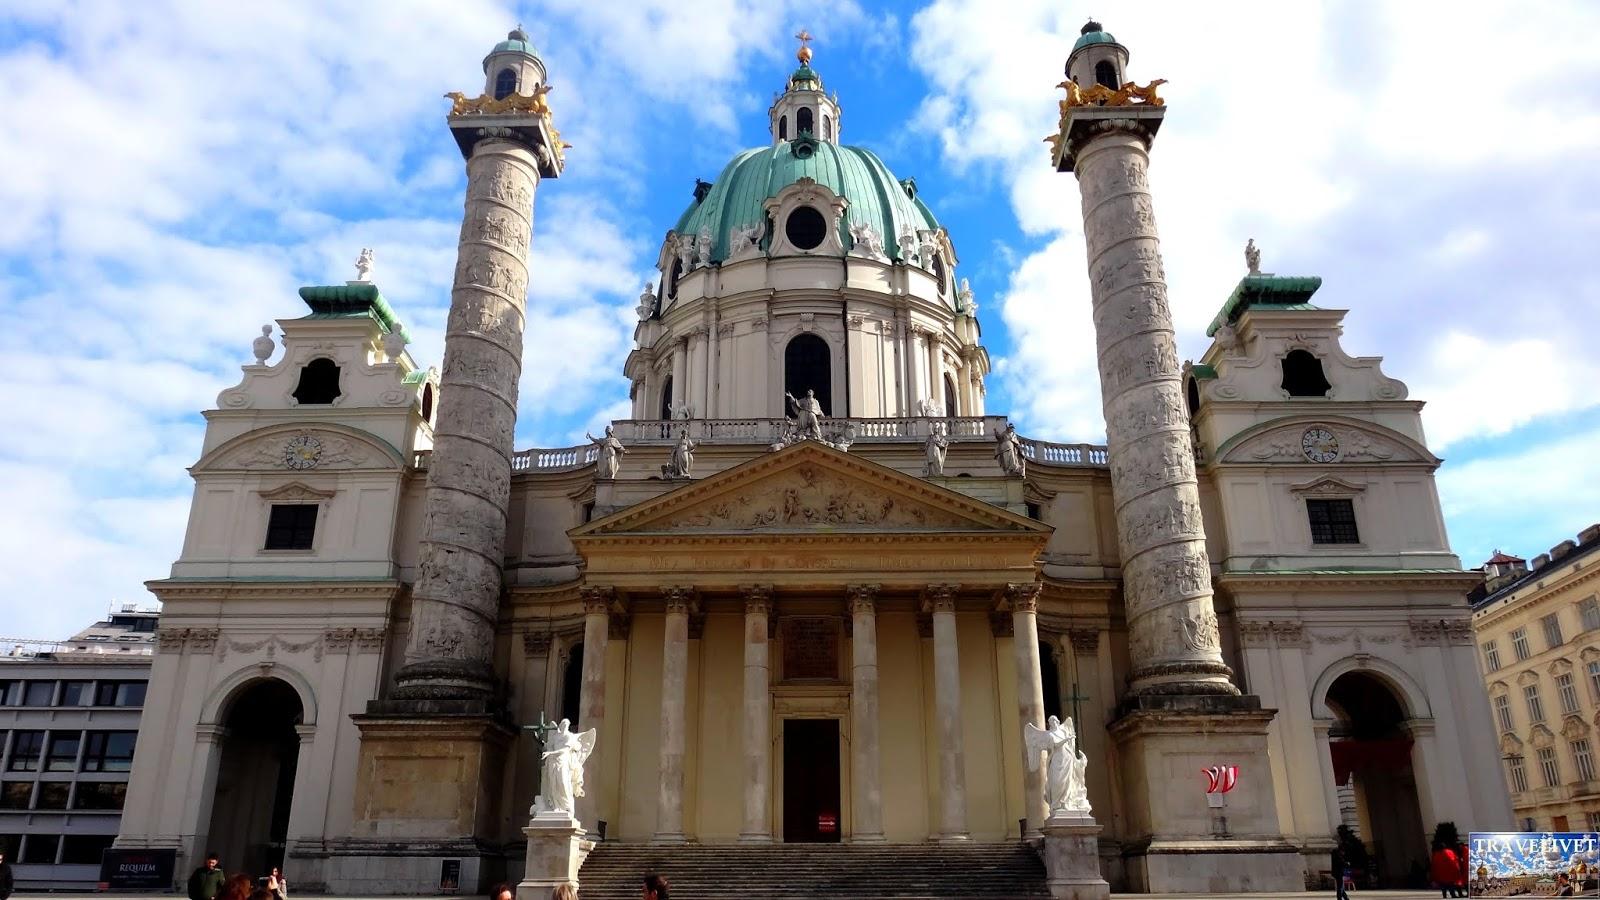 Autriche Vienne église Saint Charles Borromée, Karlskirche